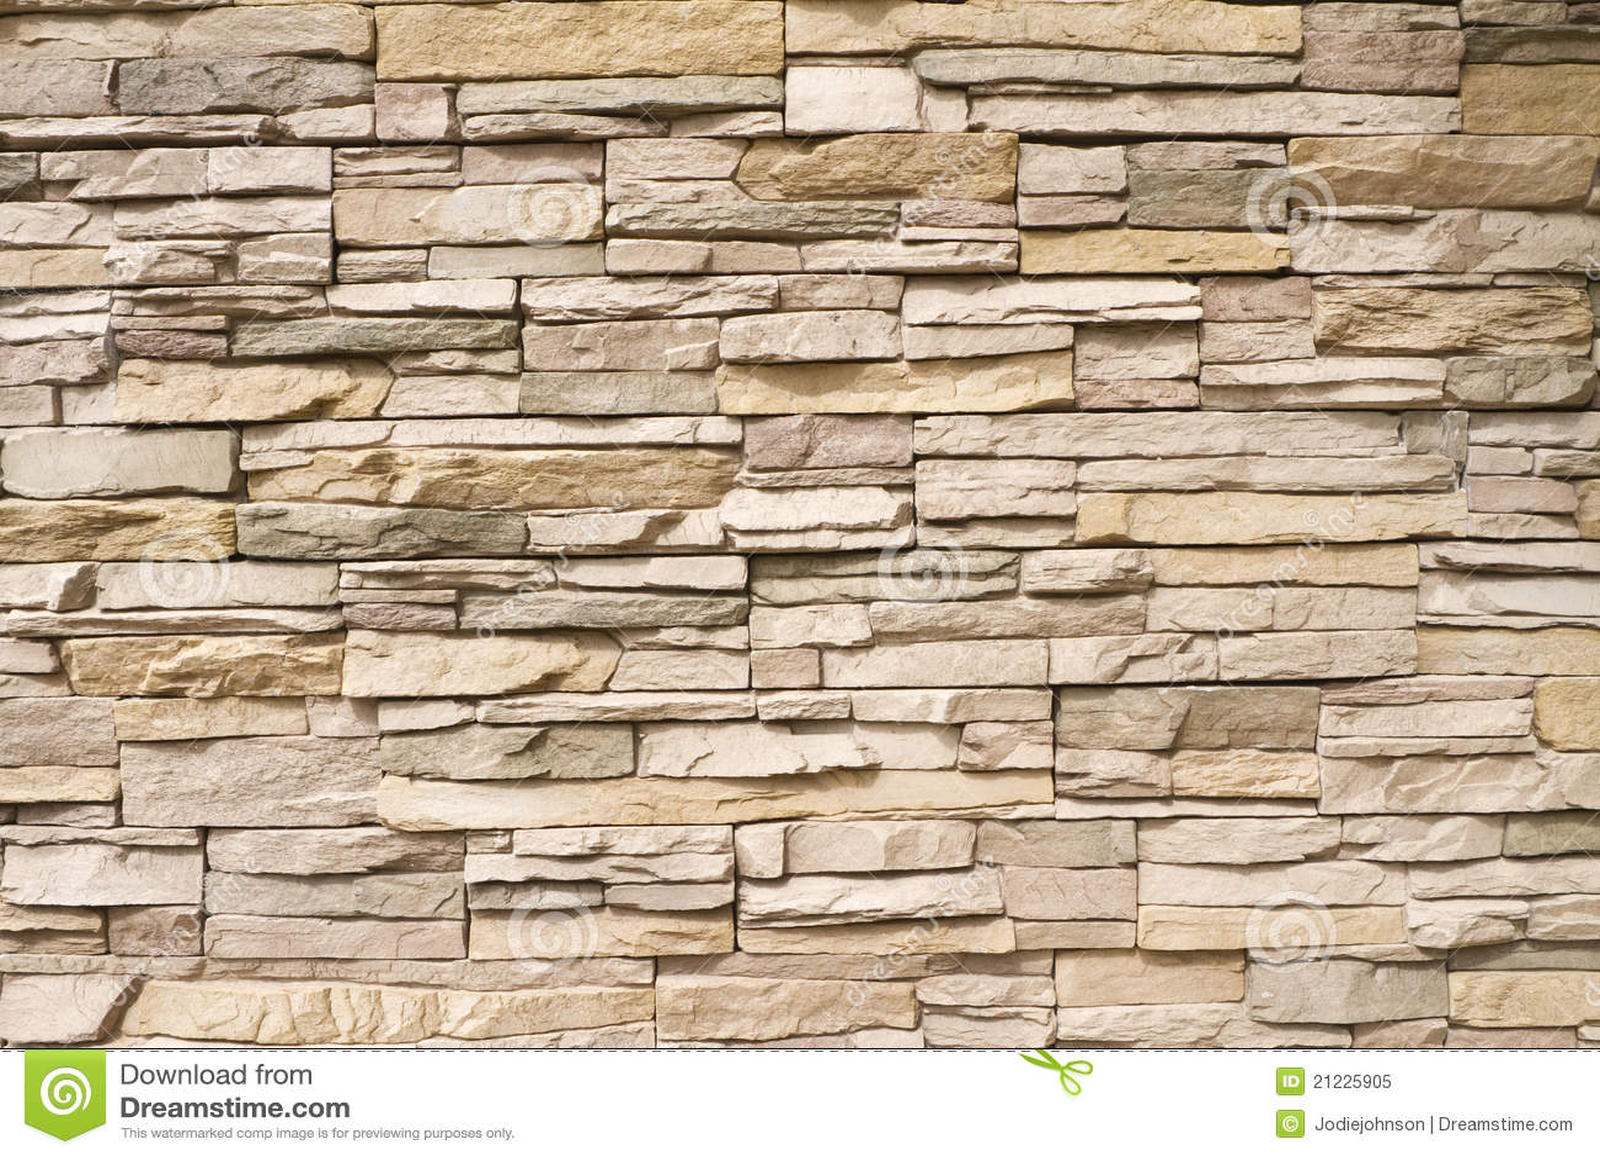 Fondo empilado de la pared de piedra horizontal imagen de - Pared de piedra ...